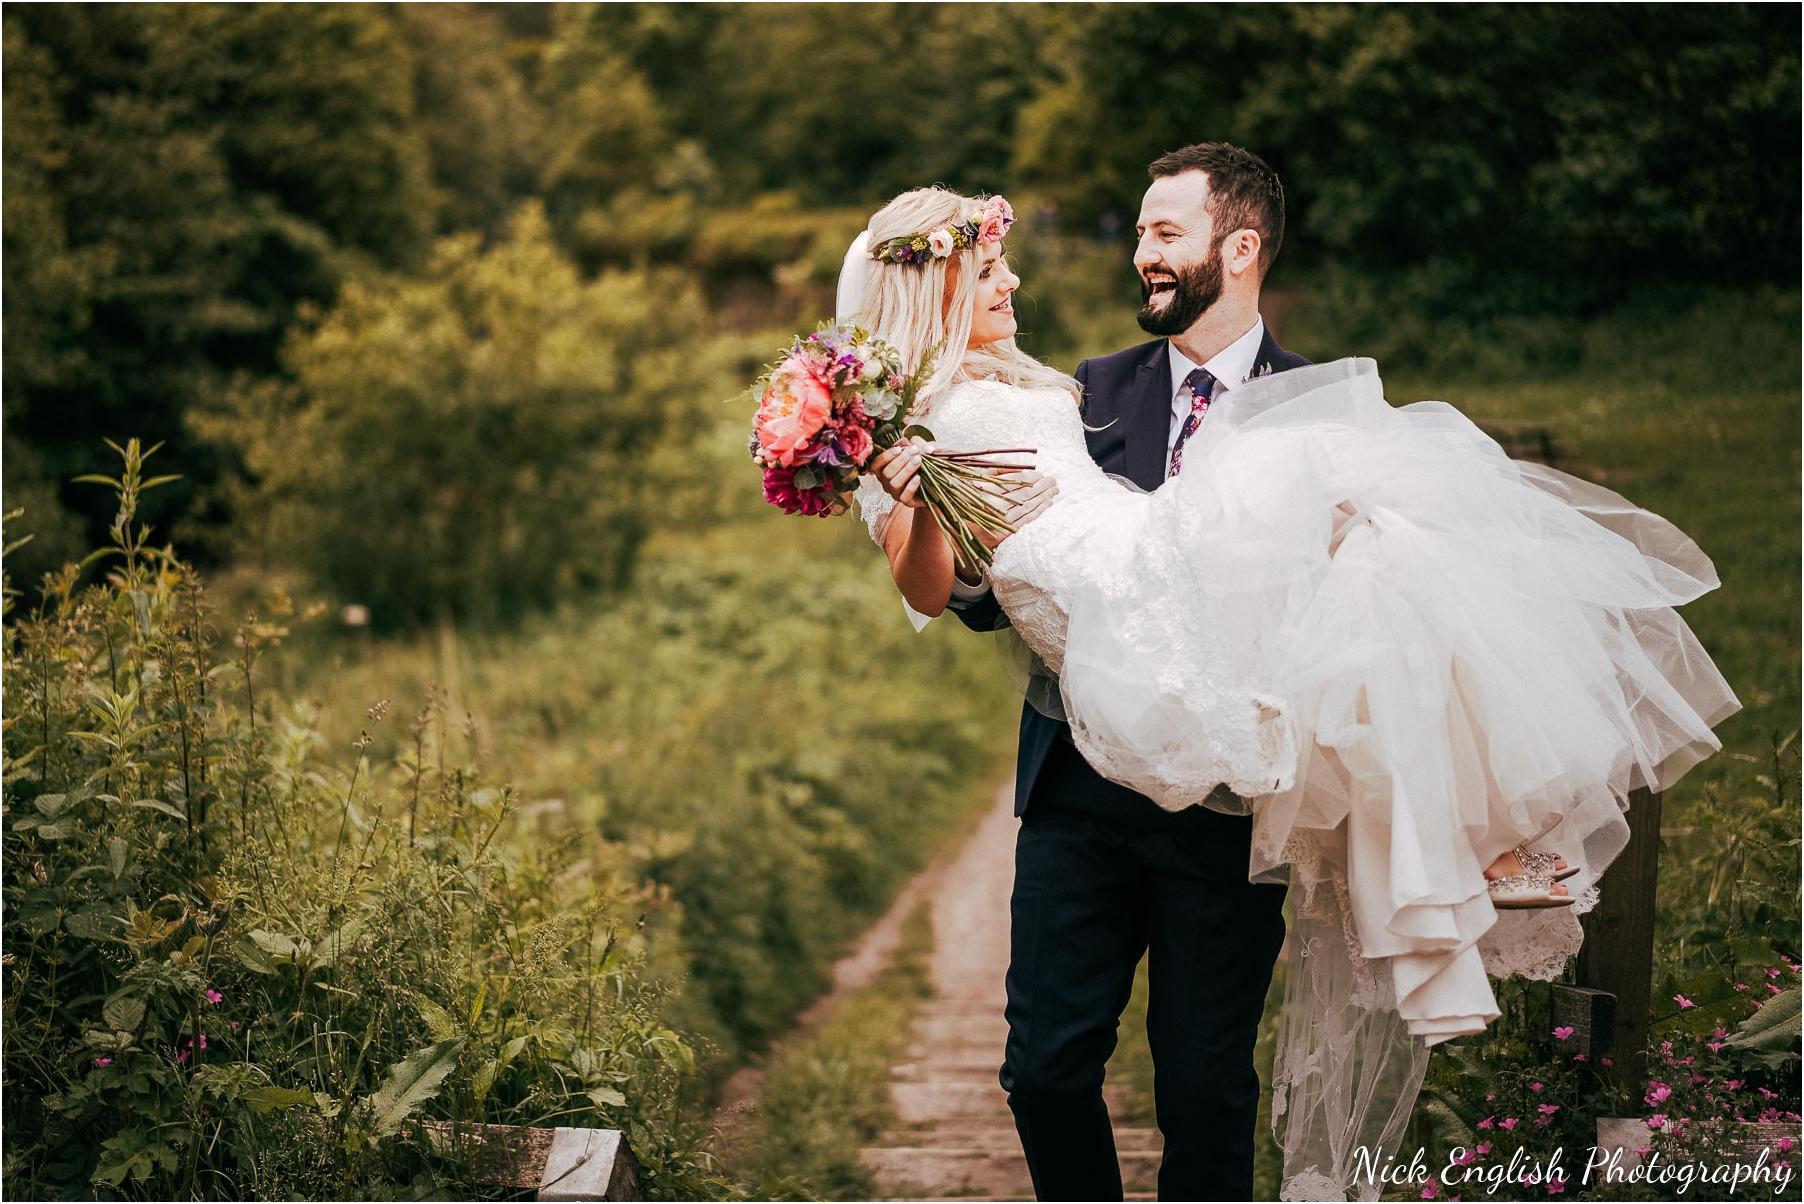 Whitebottom_Farm_Wedding_Manchester_Photograph-48.jpg